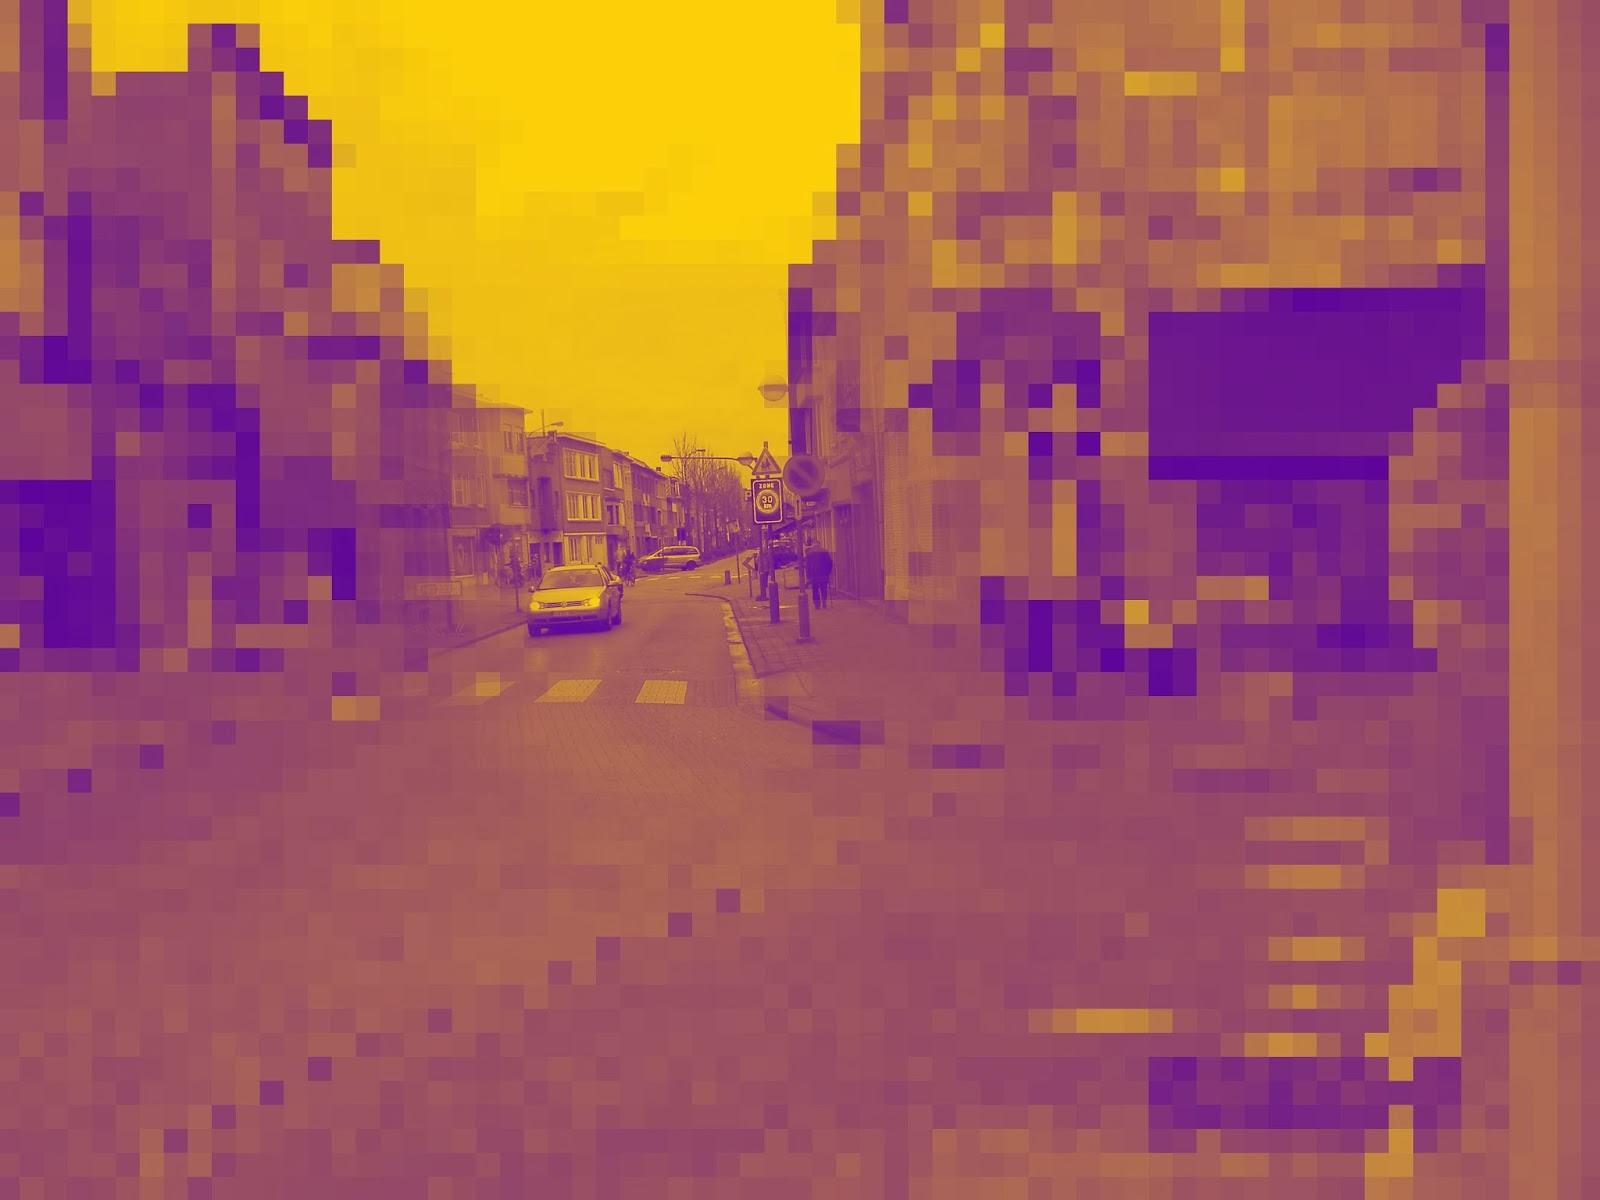 http://detandem3a.blogspot.be/2014/03/fotoquiz-waar-is-dit.html